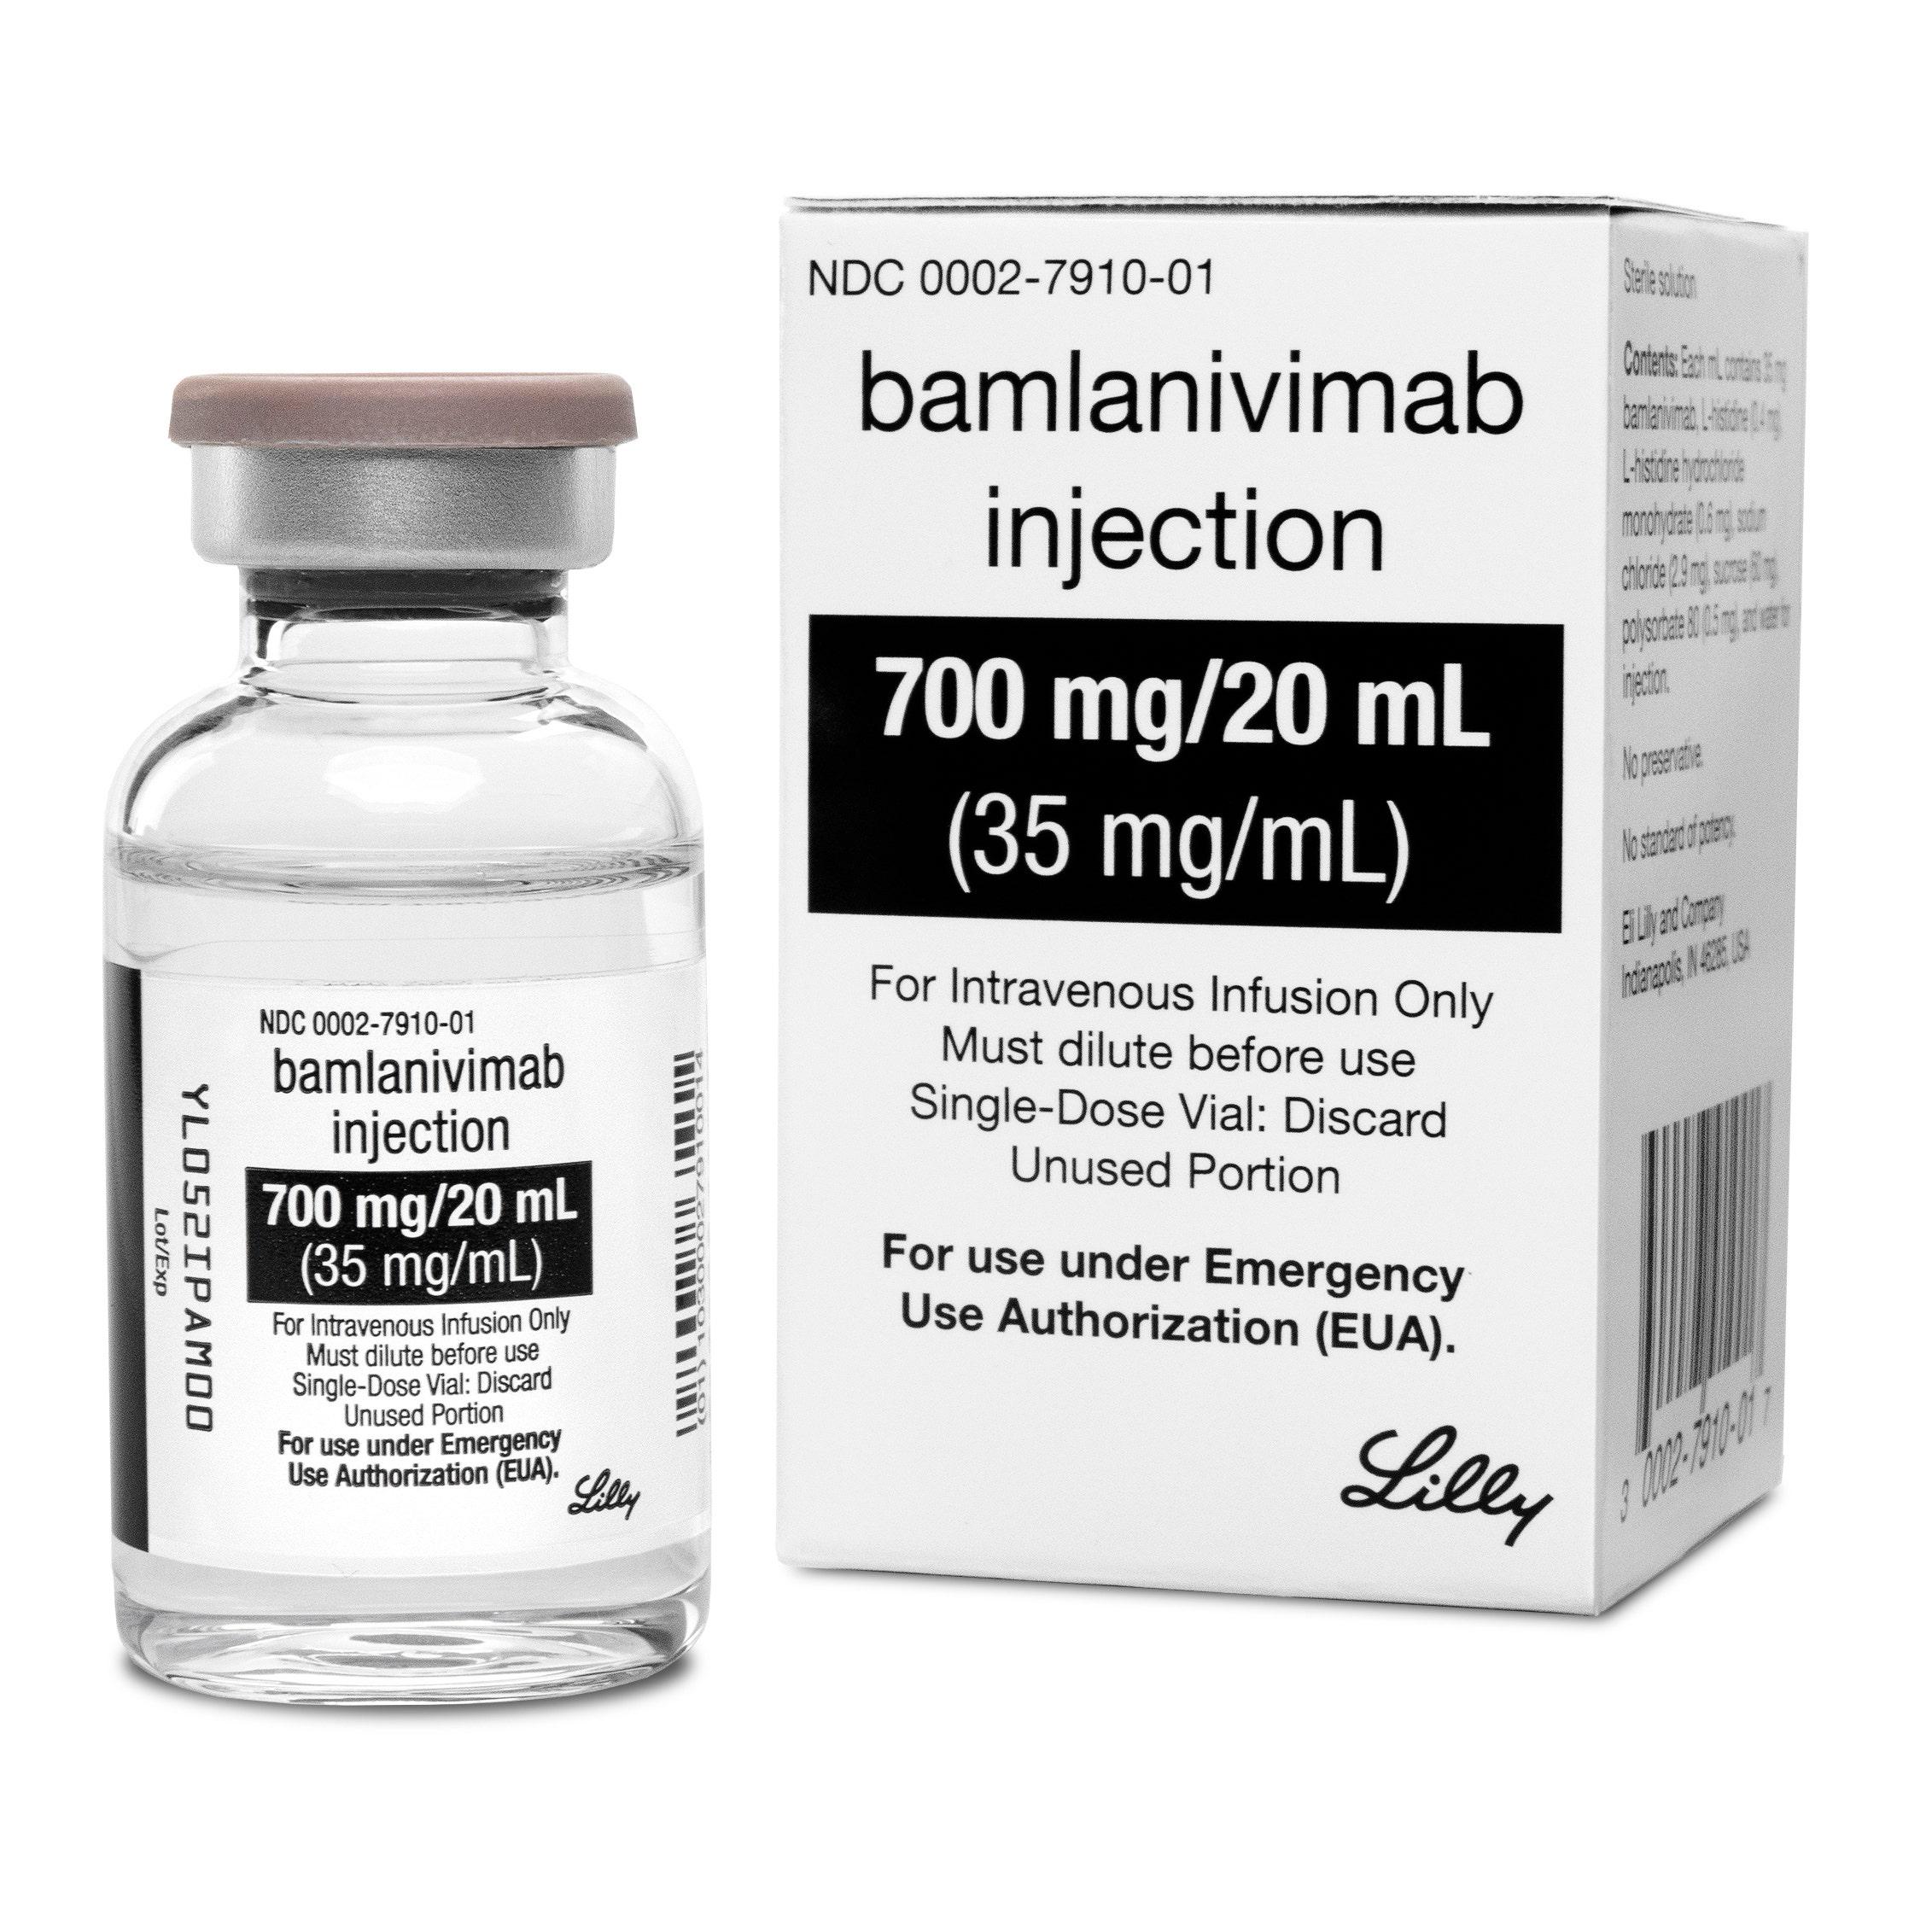 FDA clears Eli Lilly COVID-19 antibody treatment for emergency use – Fox Business